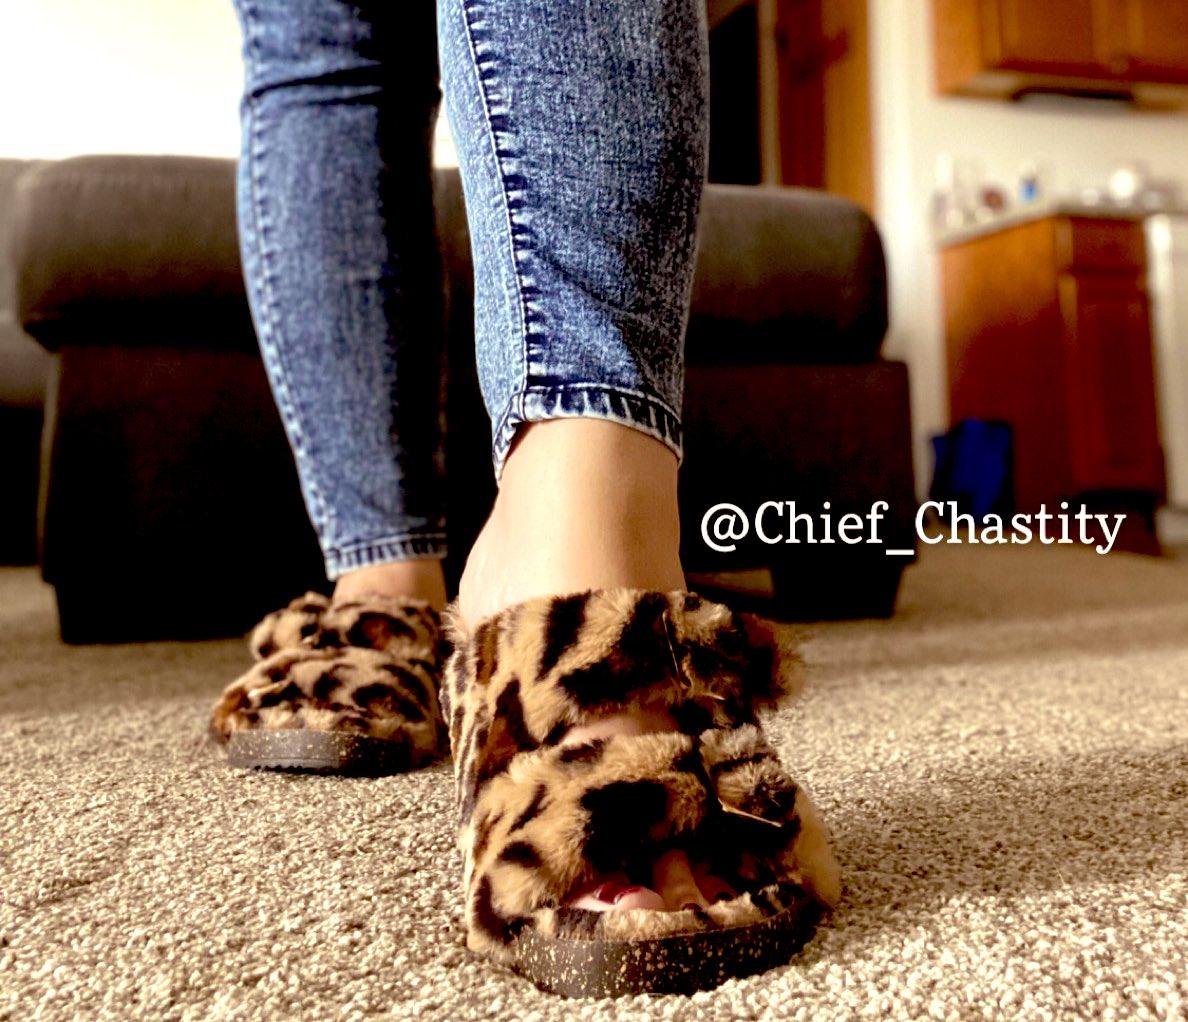 🐆 🐆 🐆  #footfetish #footdom #findom  @rtmongrel @rt_feet @FootParadiseRT @RTfdom @RTFD_ https://t.co/wCC0CIekwY